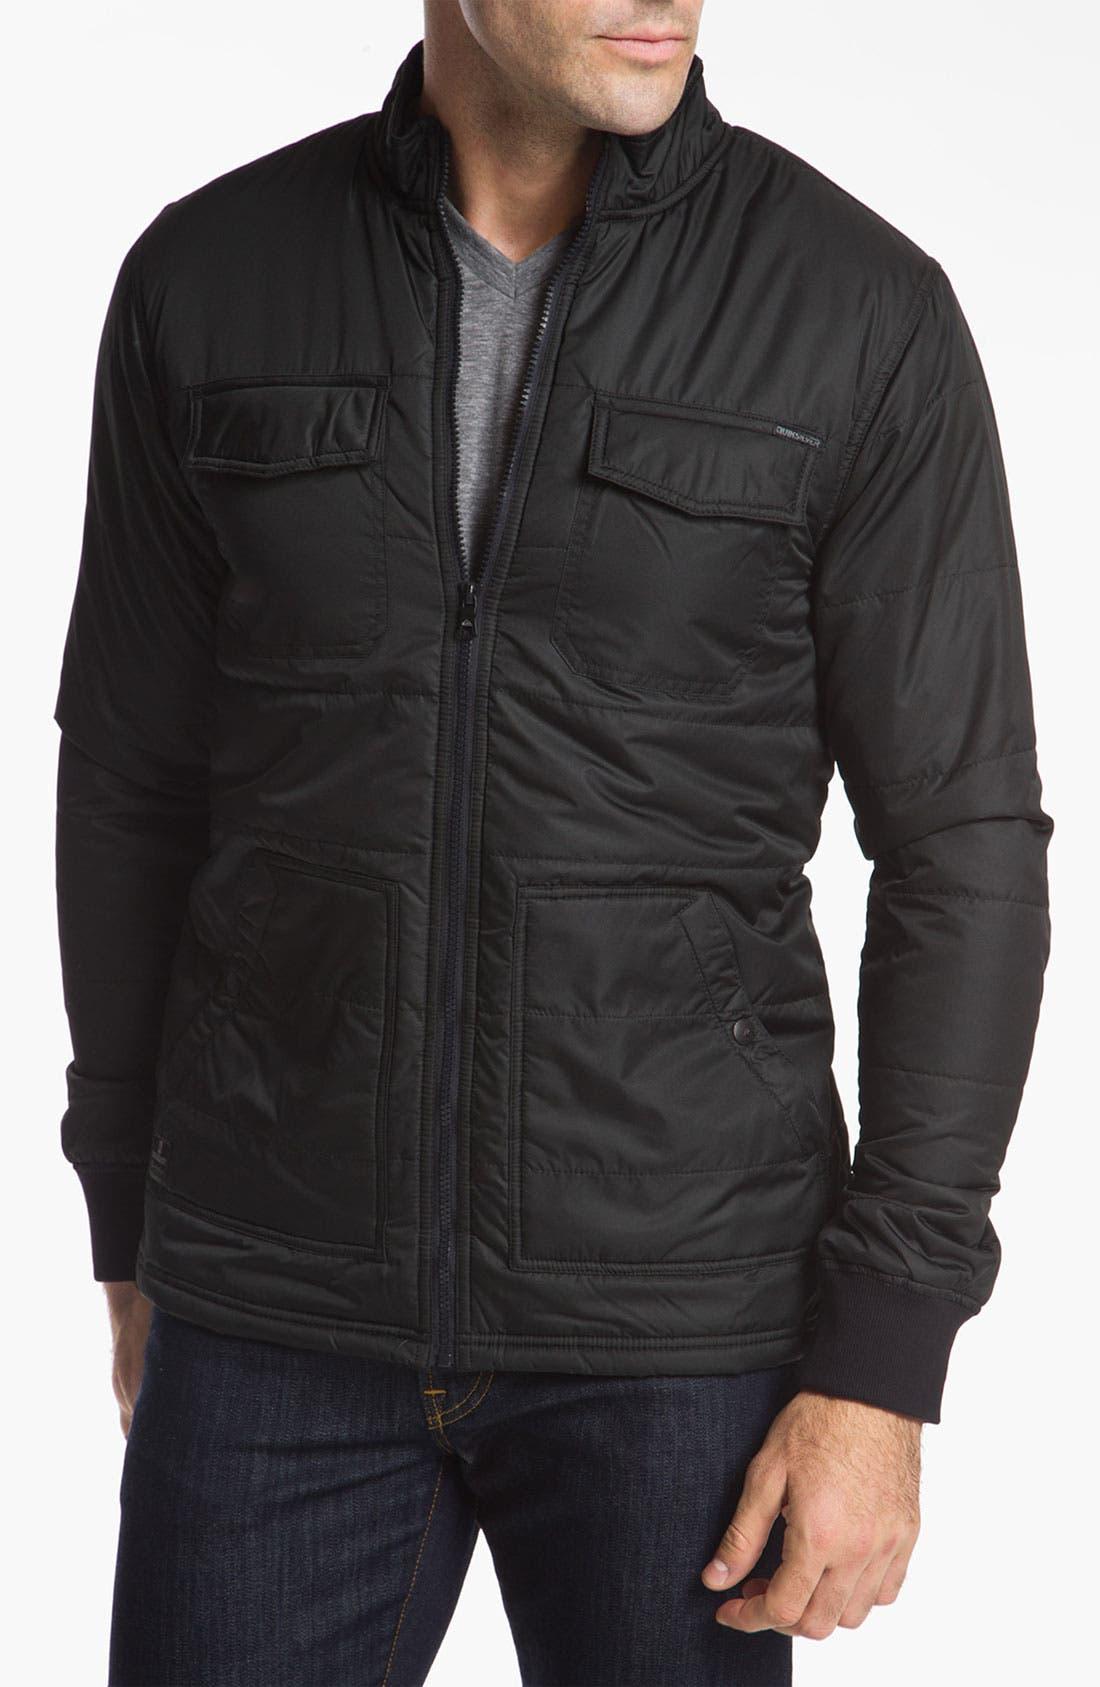 Main Image - Quiksilver 'Steadfast' Jacket